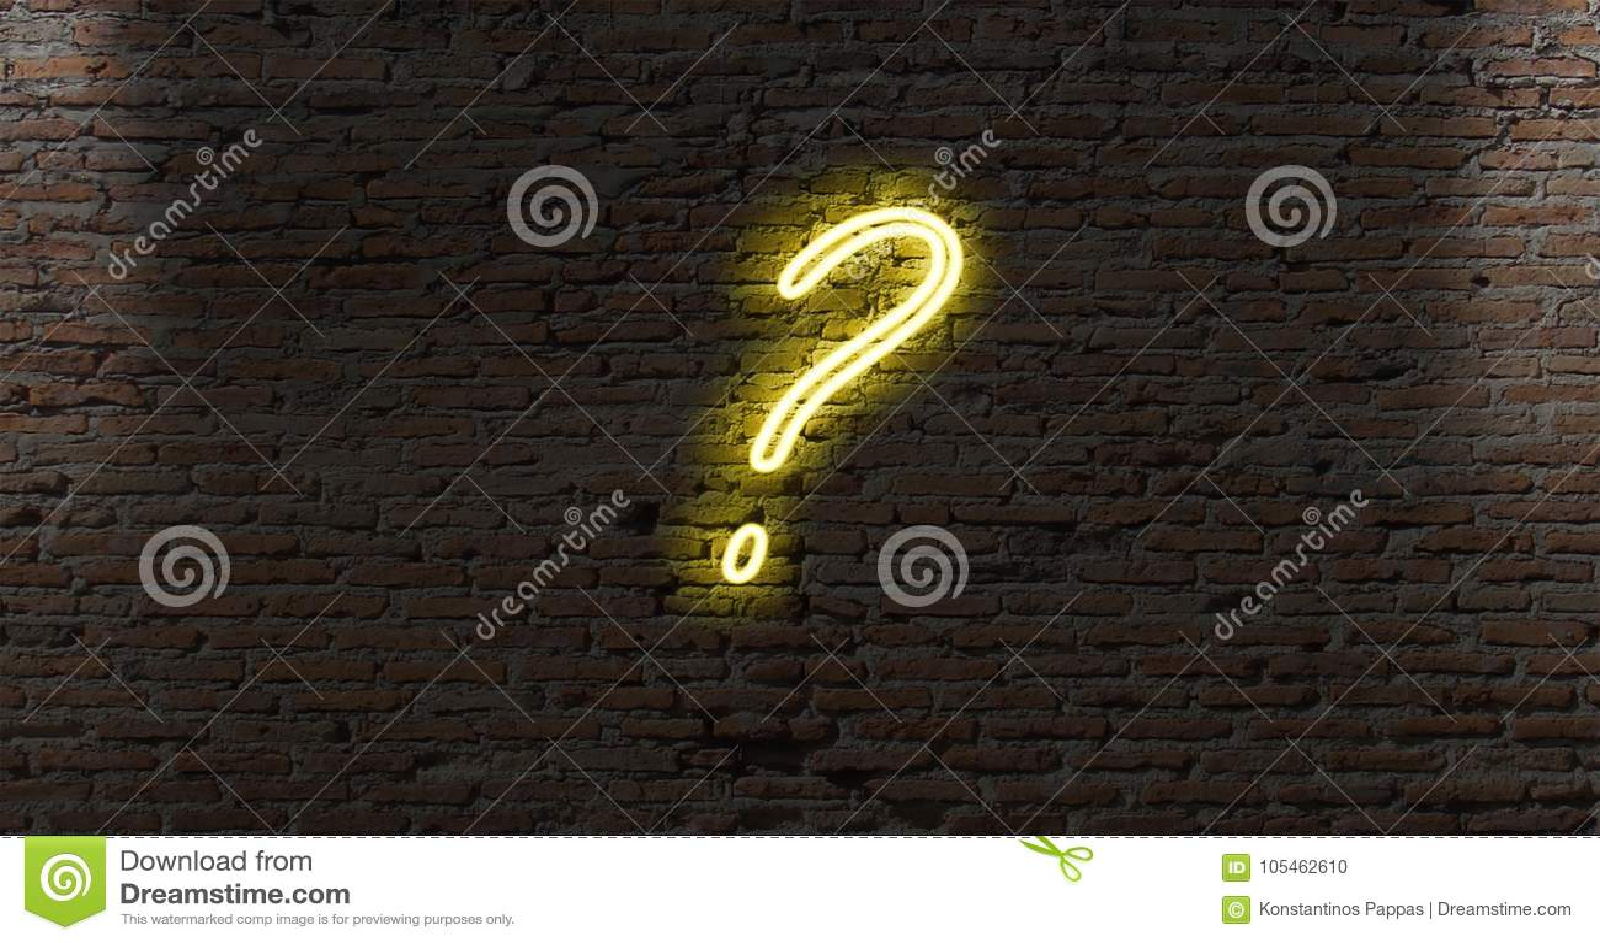 neon light question marks on a dark brick wall